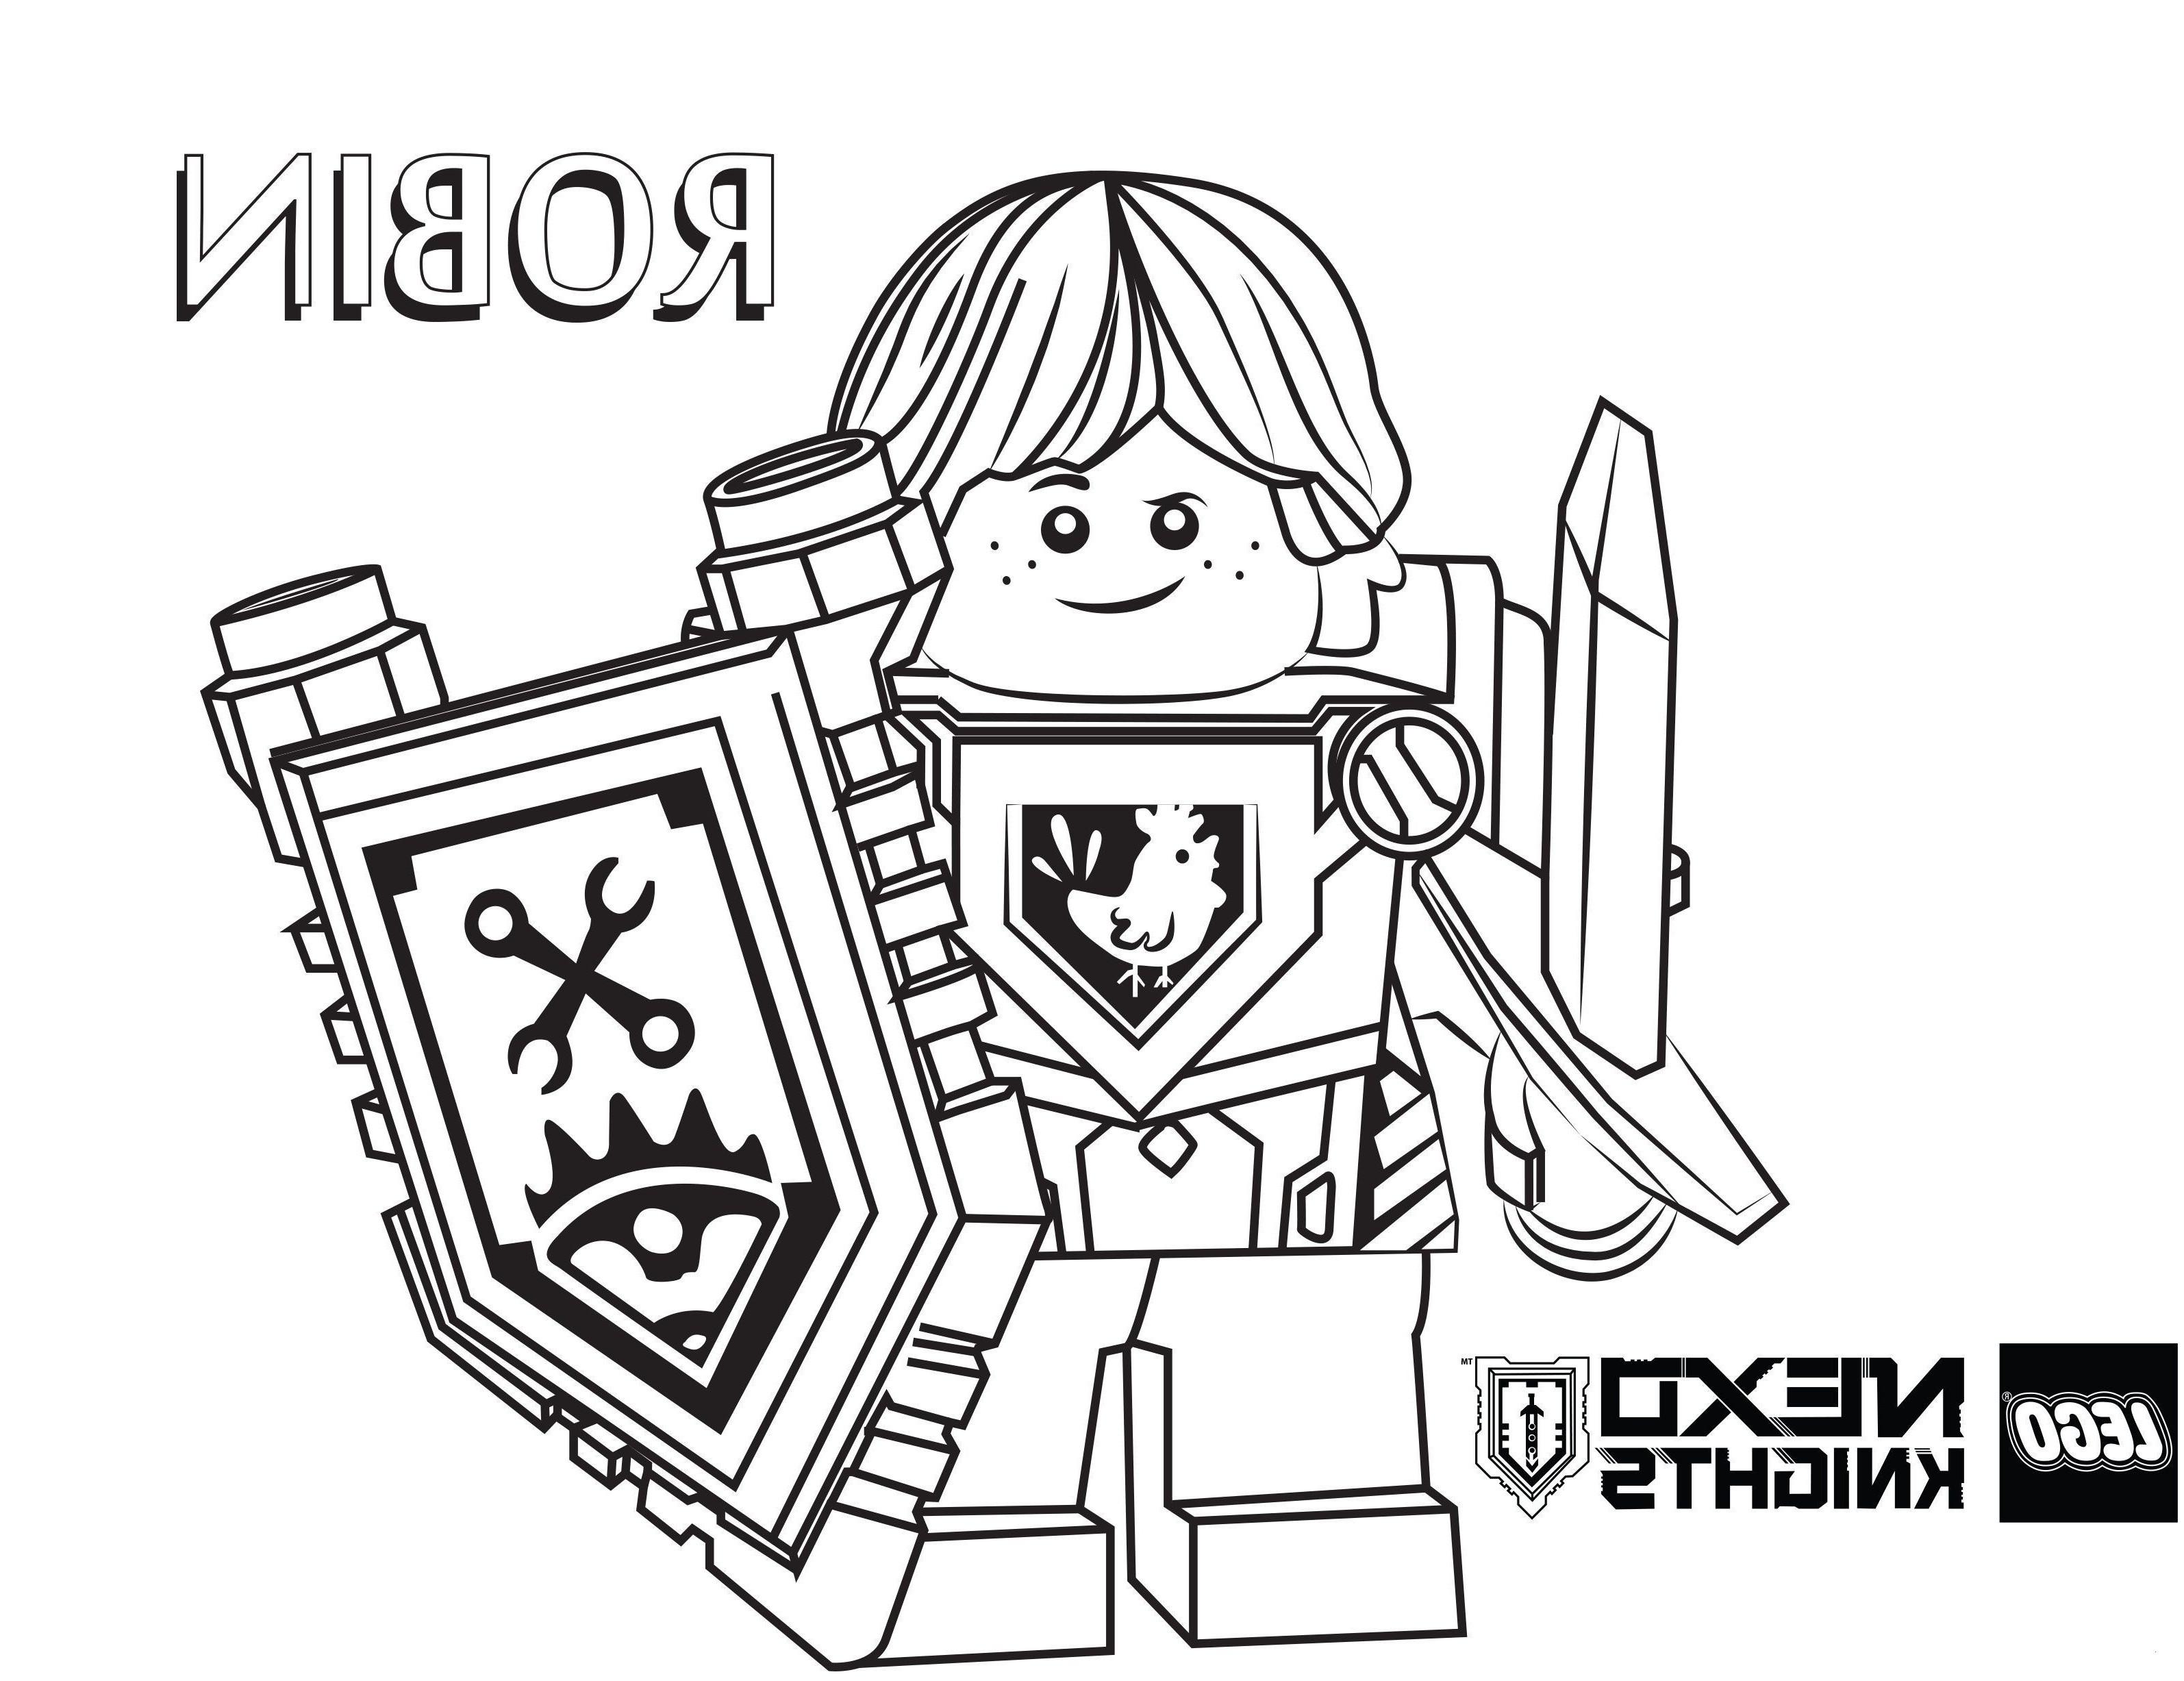 Ninjago Morro Ausmalbilder Einzigartig 30 Lecker Ninjago Morro Ausmalbilder – Malvorlagen Ideen Bild